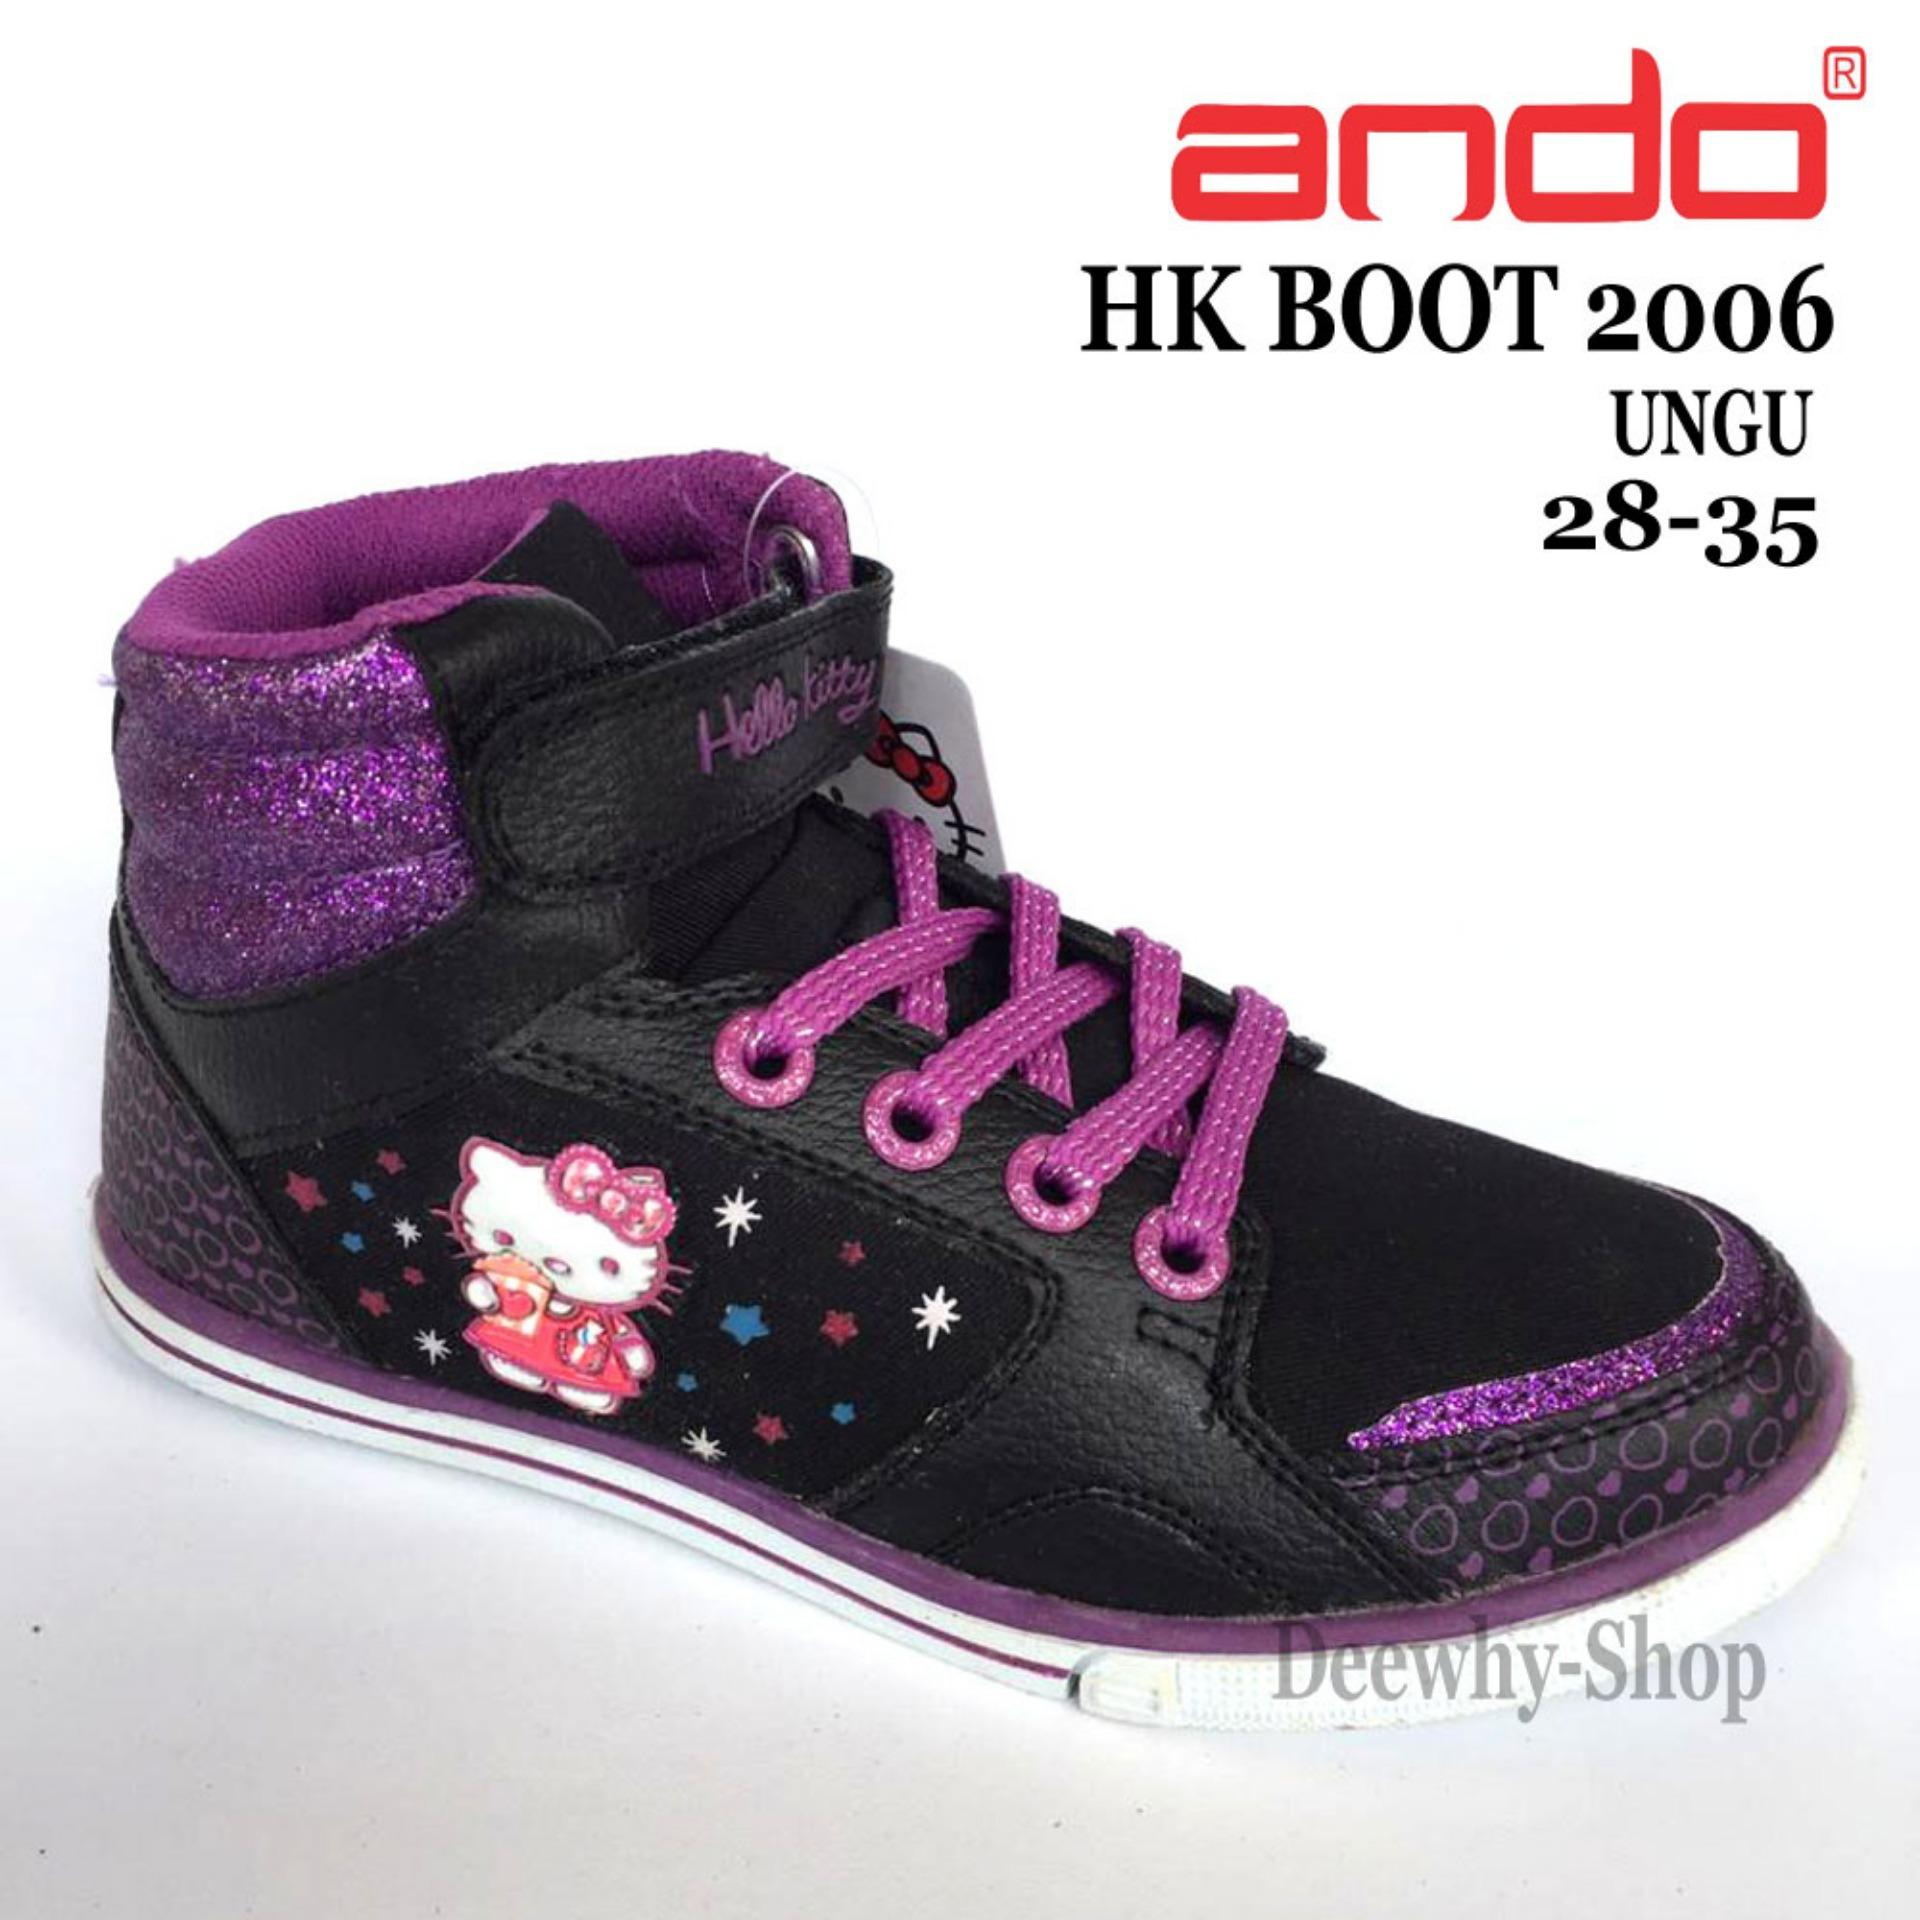 Ando Sepatu Anak Perempuan Hellokitty HK BOOT 2006 - Hitam Ungu - size 25- f96b0bc1e1